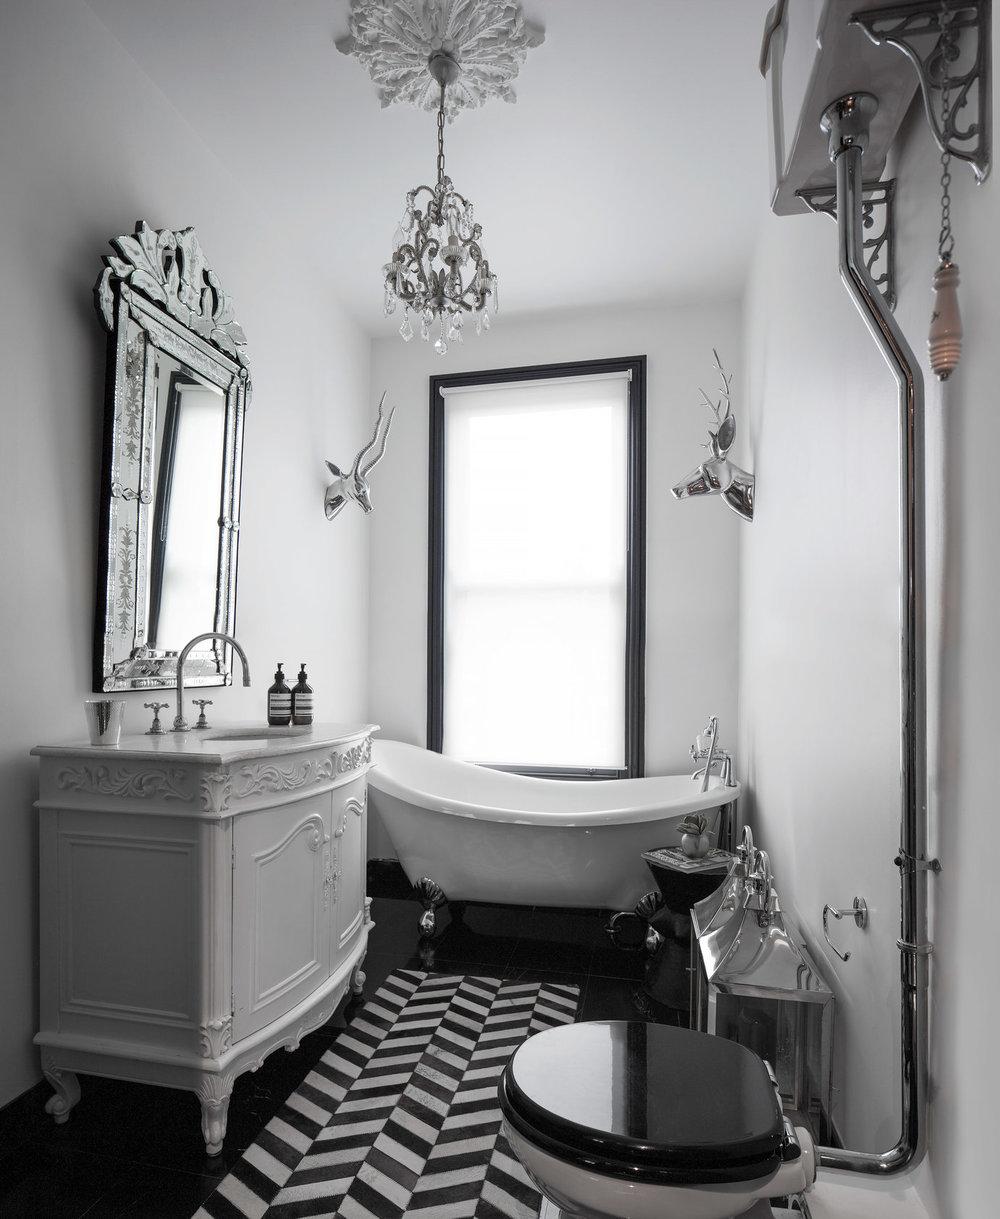 Casa-Botelho-Bathroom-Juliet-Murphy.jpg